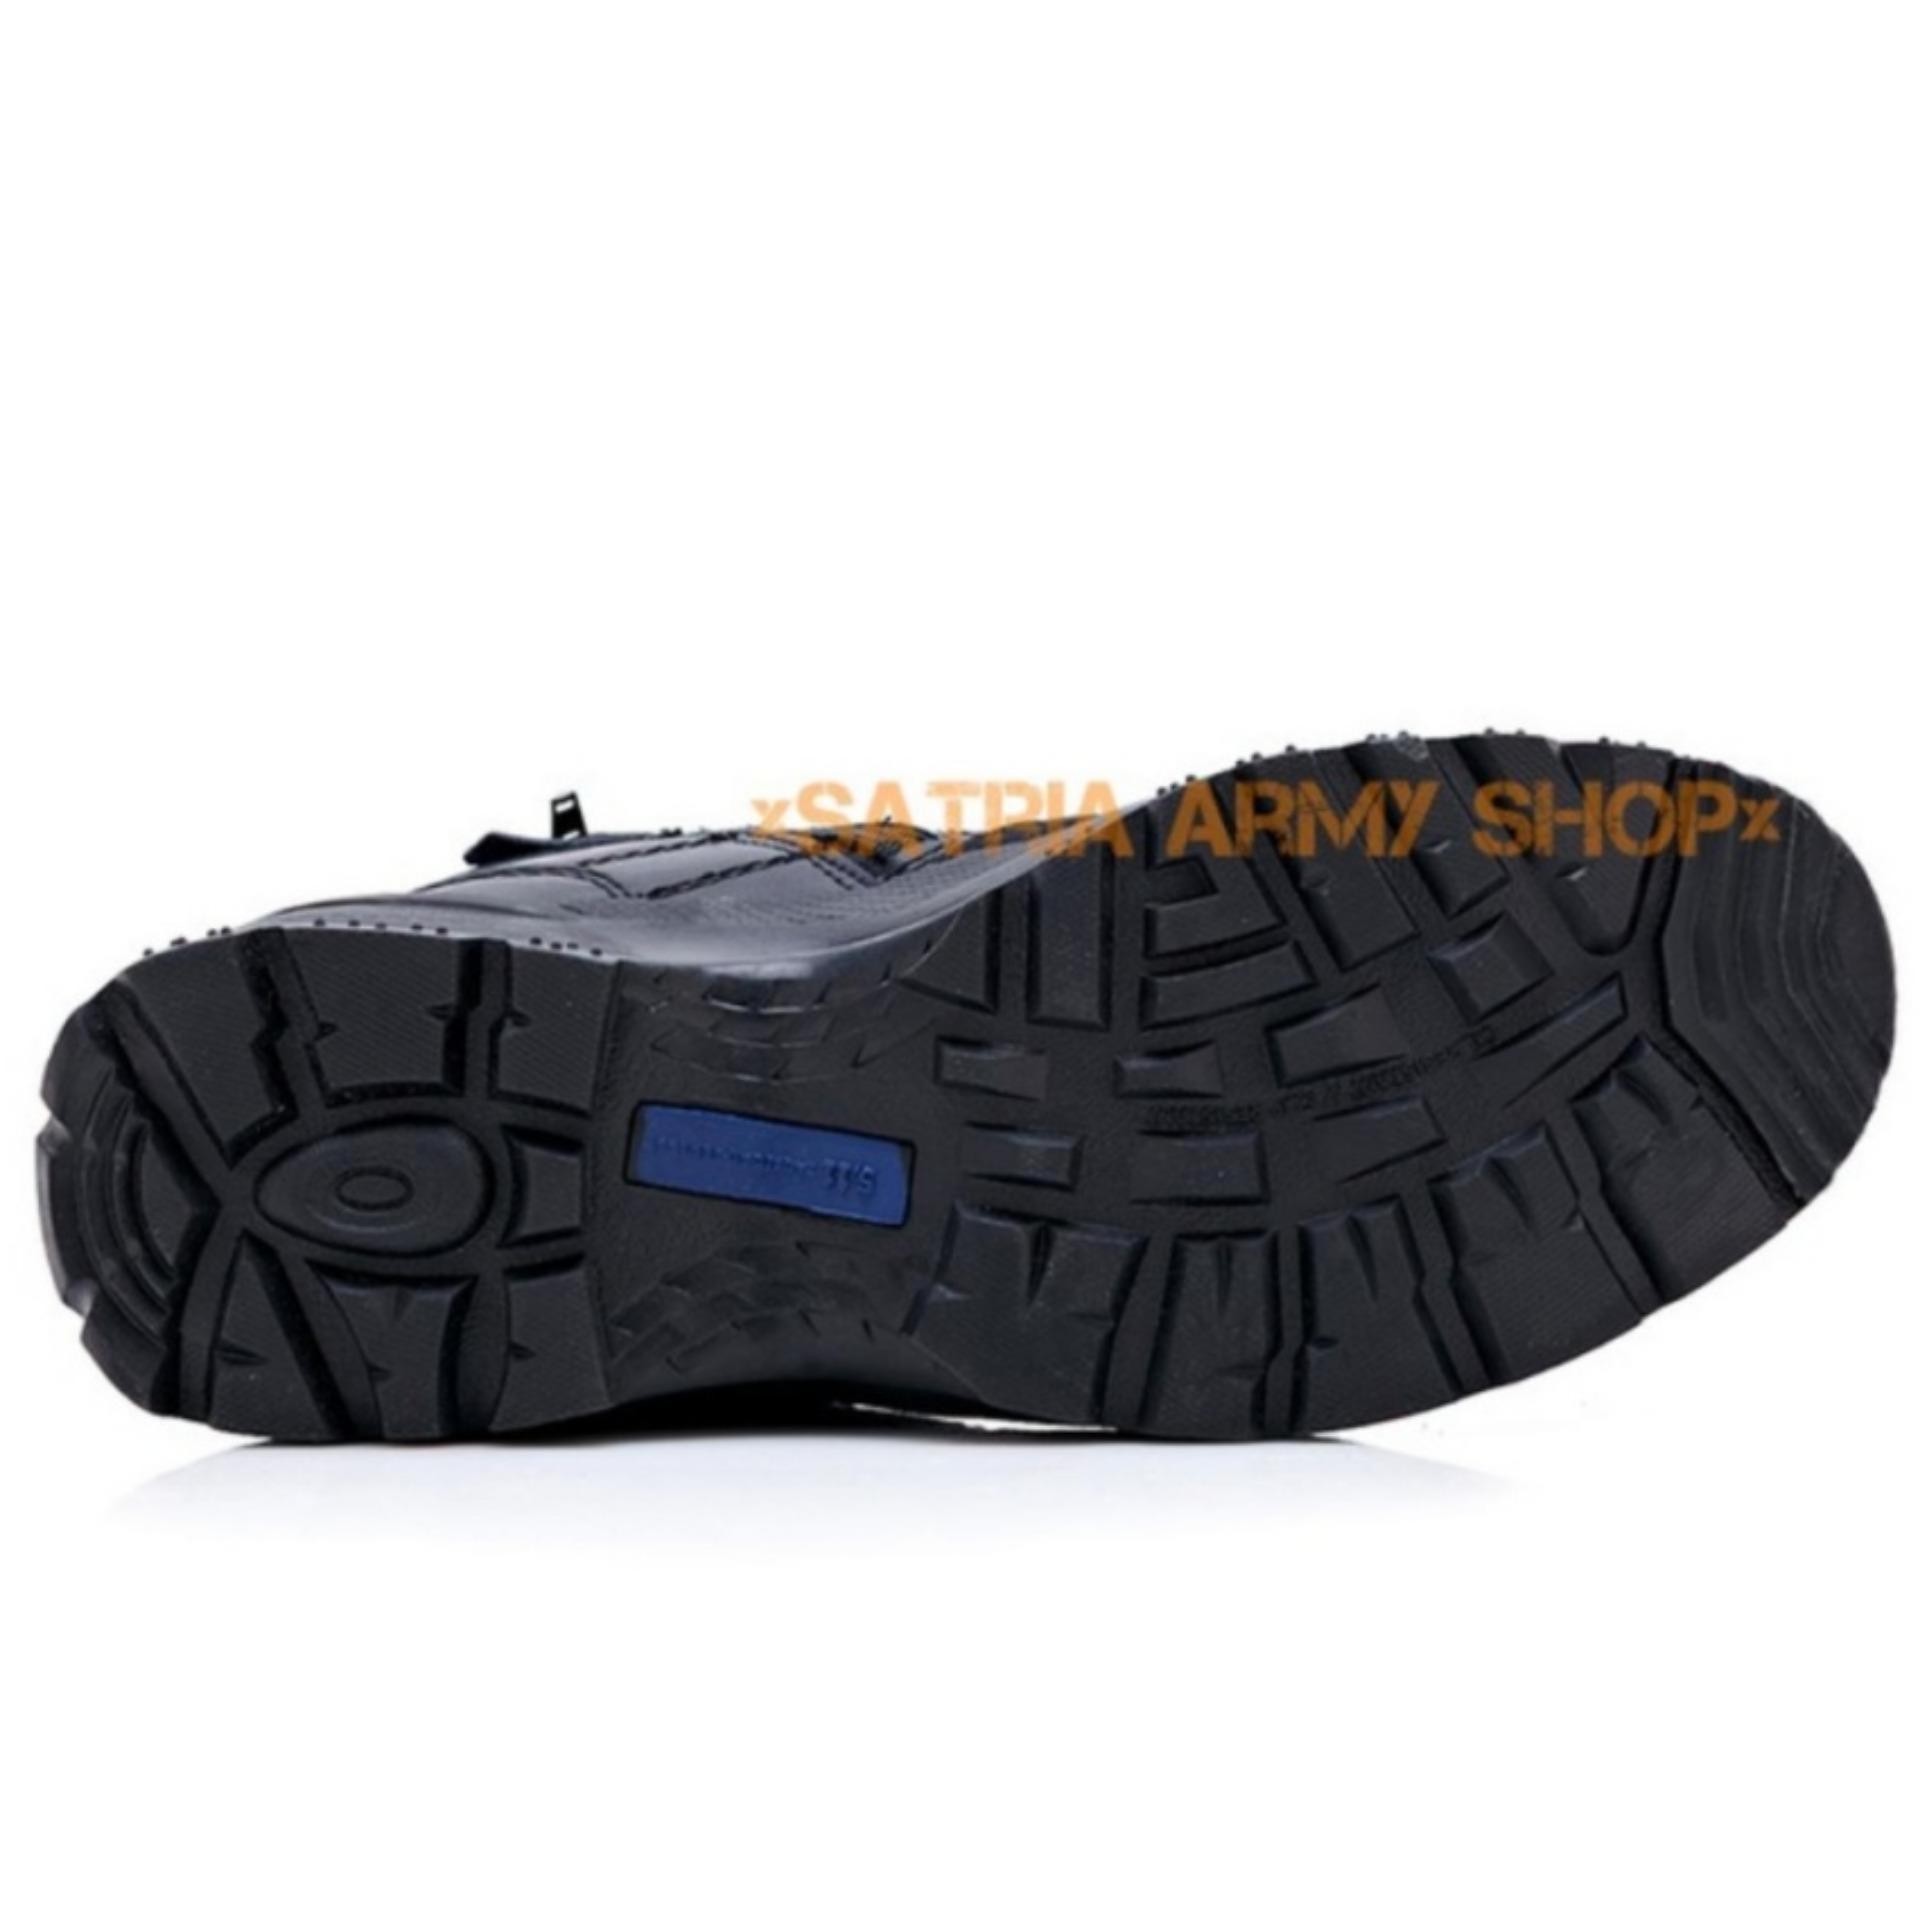 Sepatu 511 Tactical - 6 inch Hitam Quality Original Outdoor